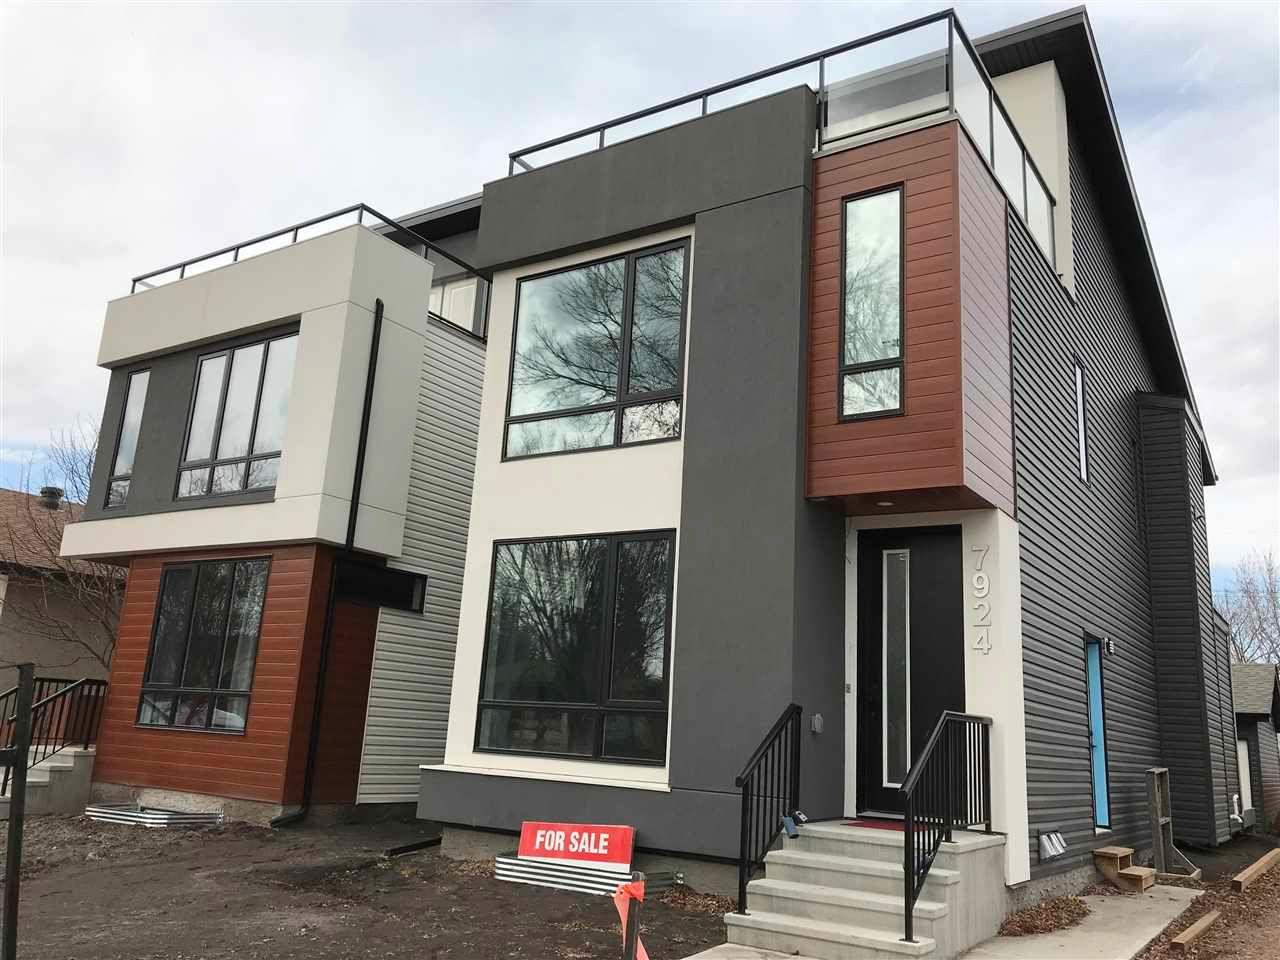 Main Photo: 7924 84 Avenue in Edmonton: Zone 18 House for sale : MLS®# E4227873